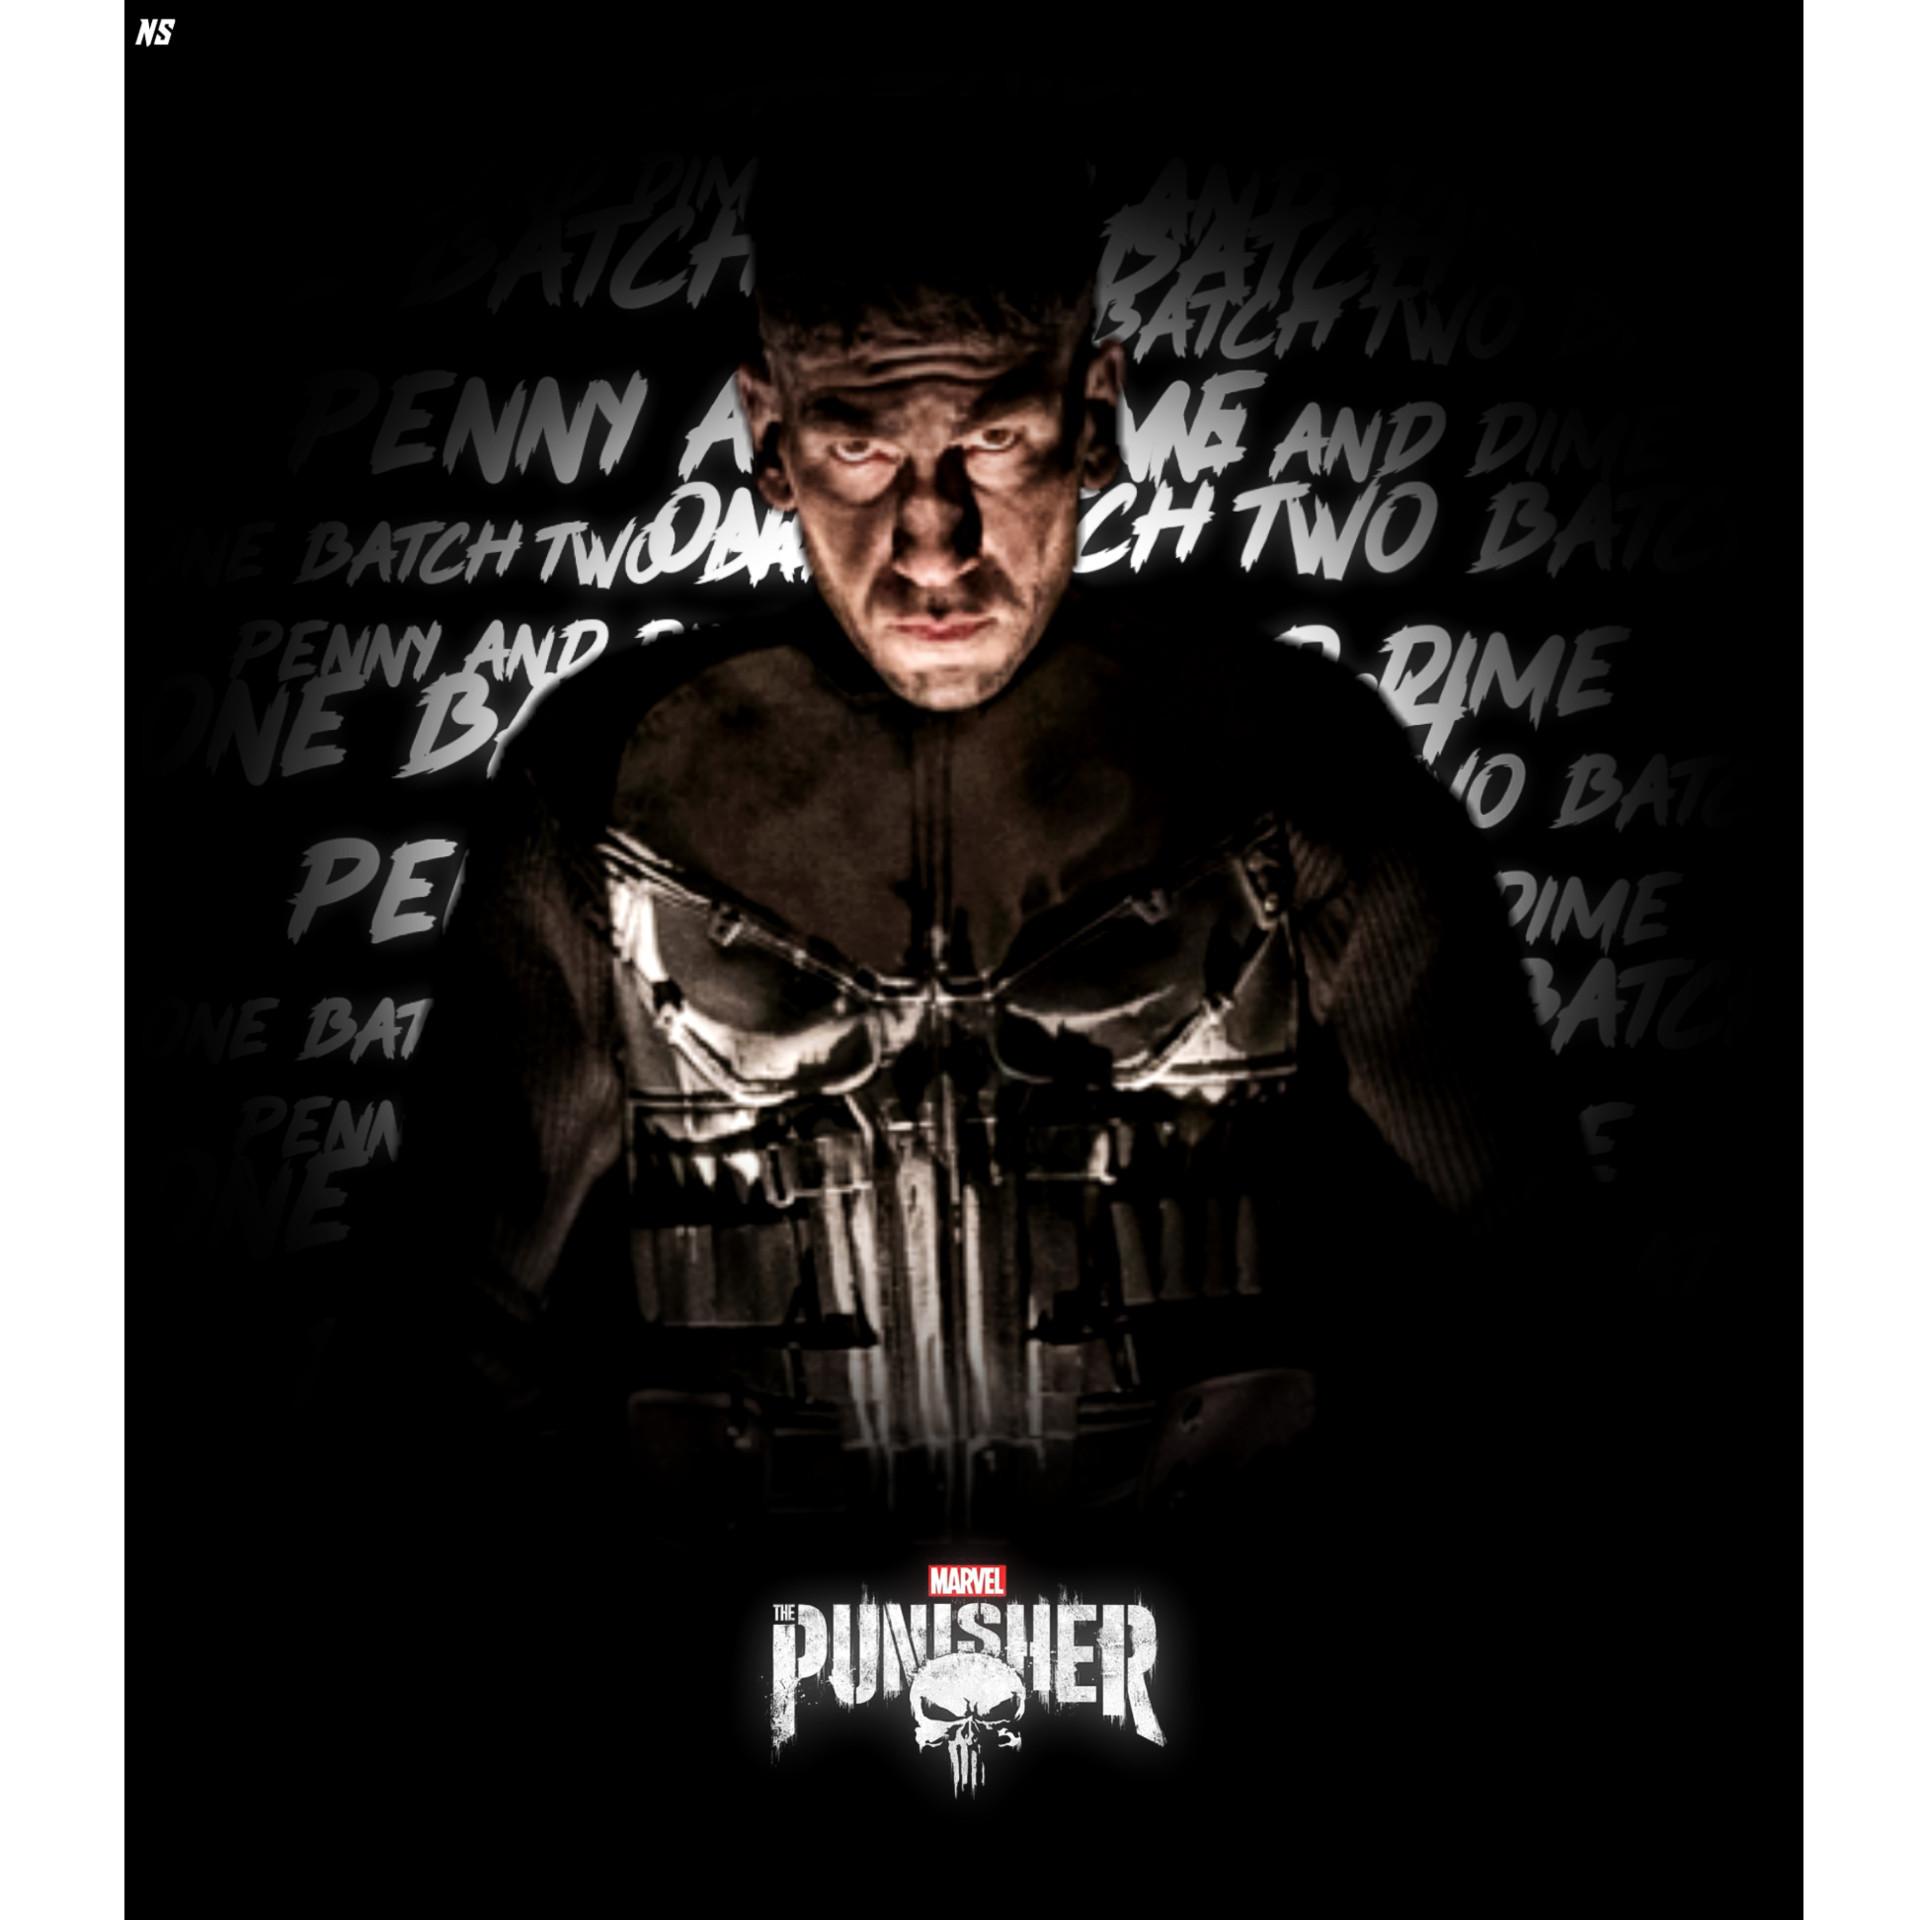 Netflix Punisher Wallpaper